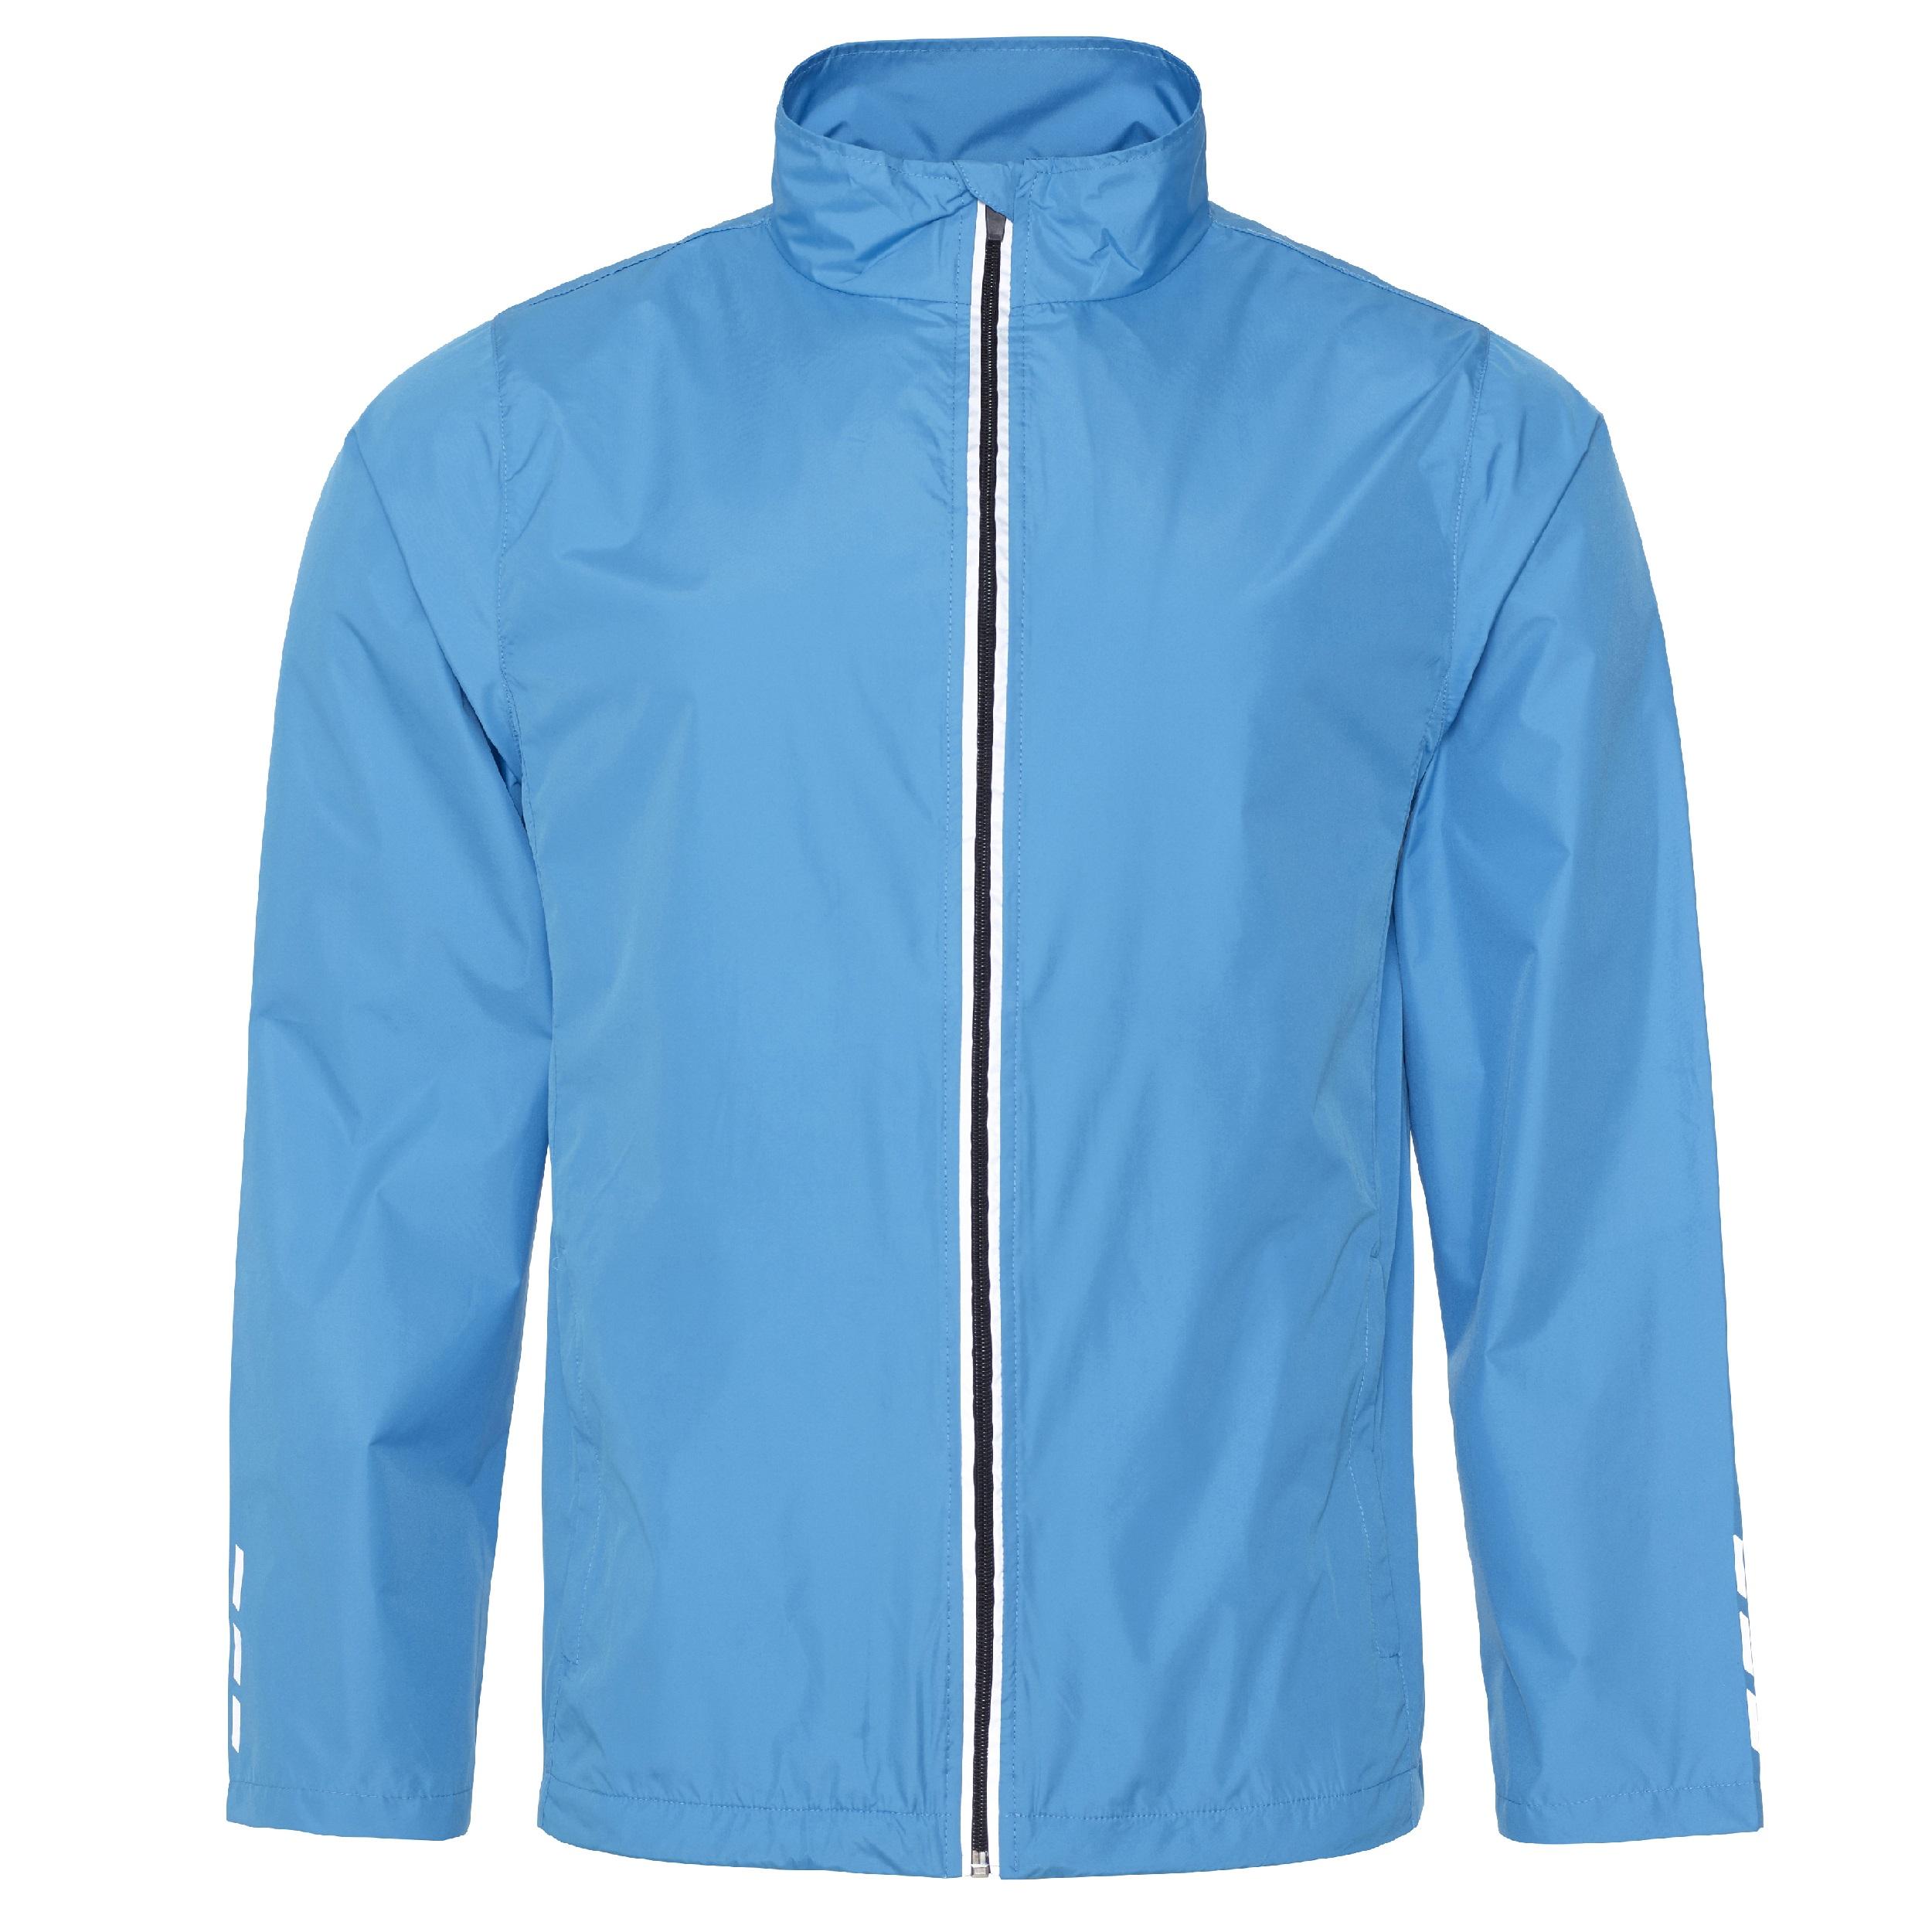 Juoksijan takki Cool, Sapphire Blue